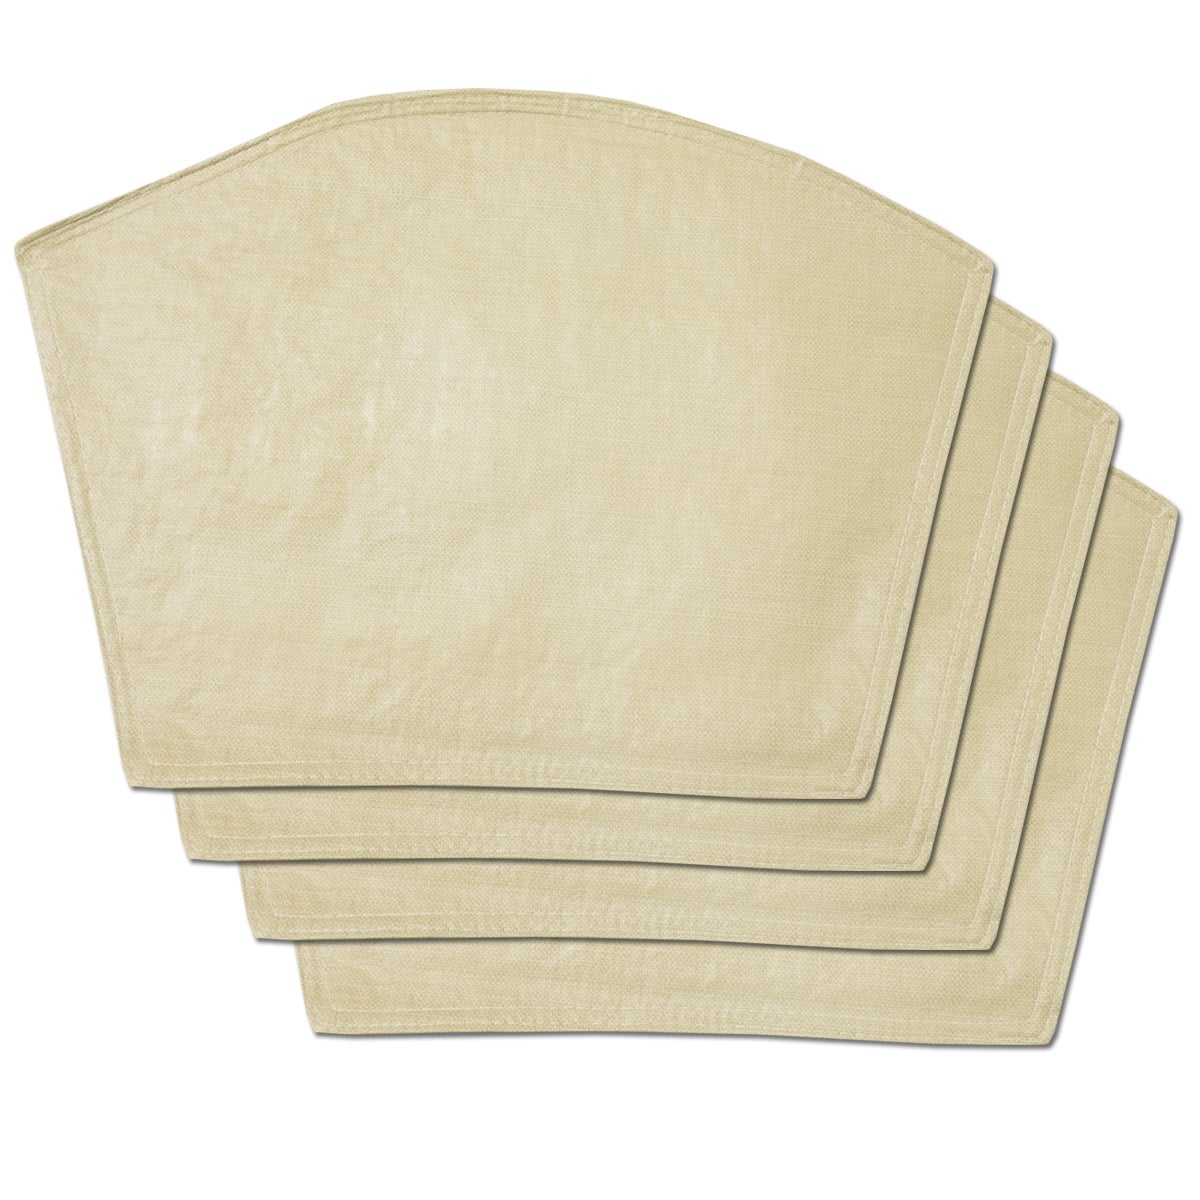 Sand Restaurant Quality Heavyweight Vinyl Wedge Table Pla...